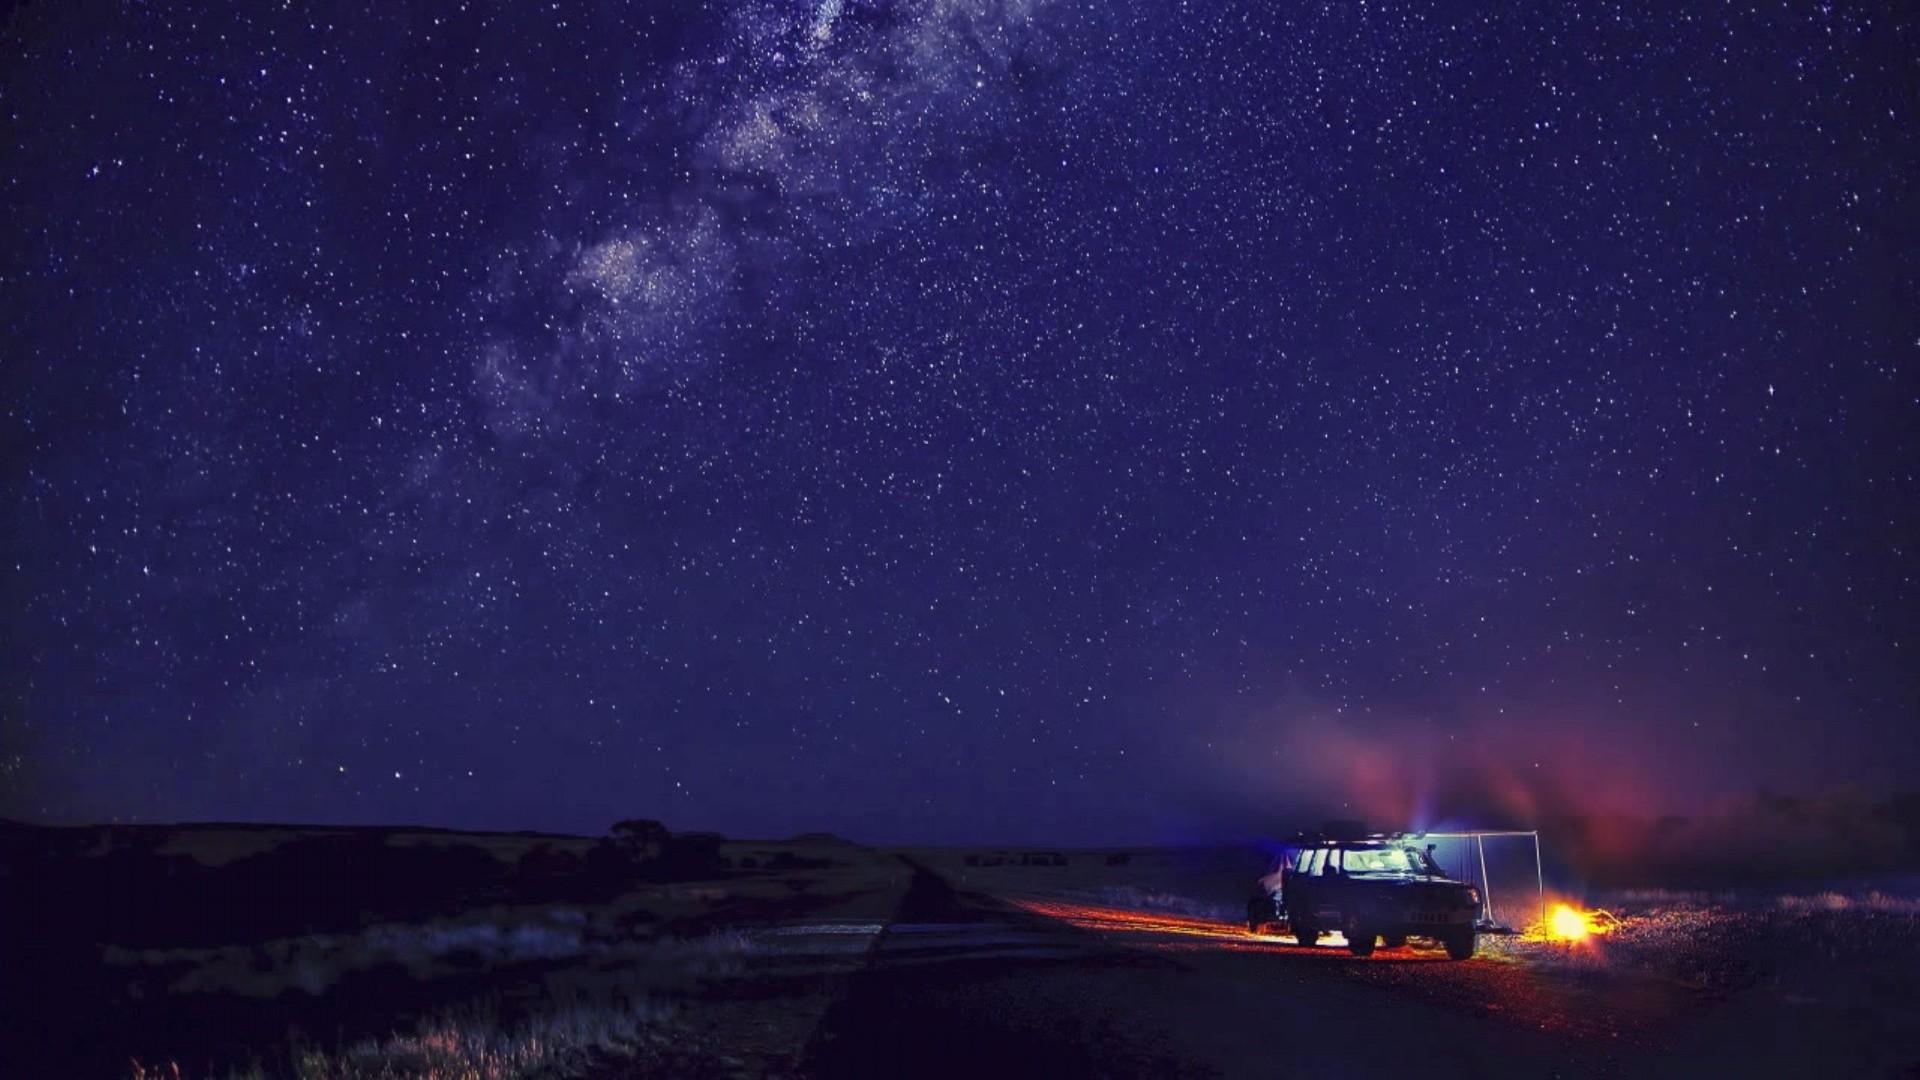 Starry Night Sky Wallpaper – WallpaperSafari